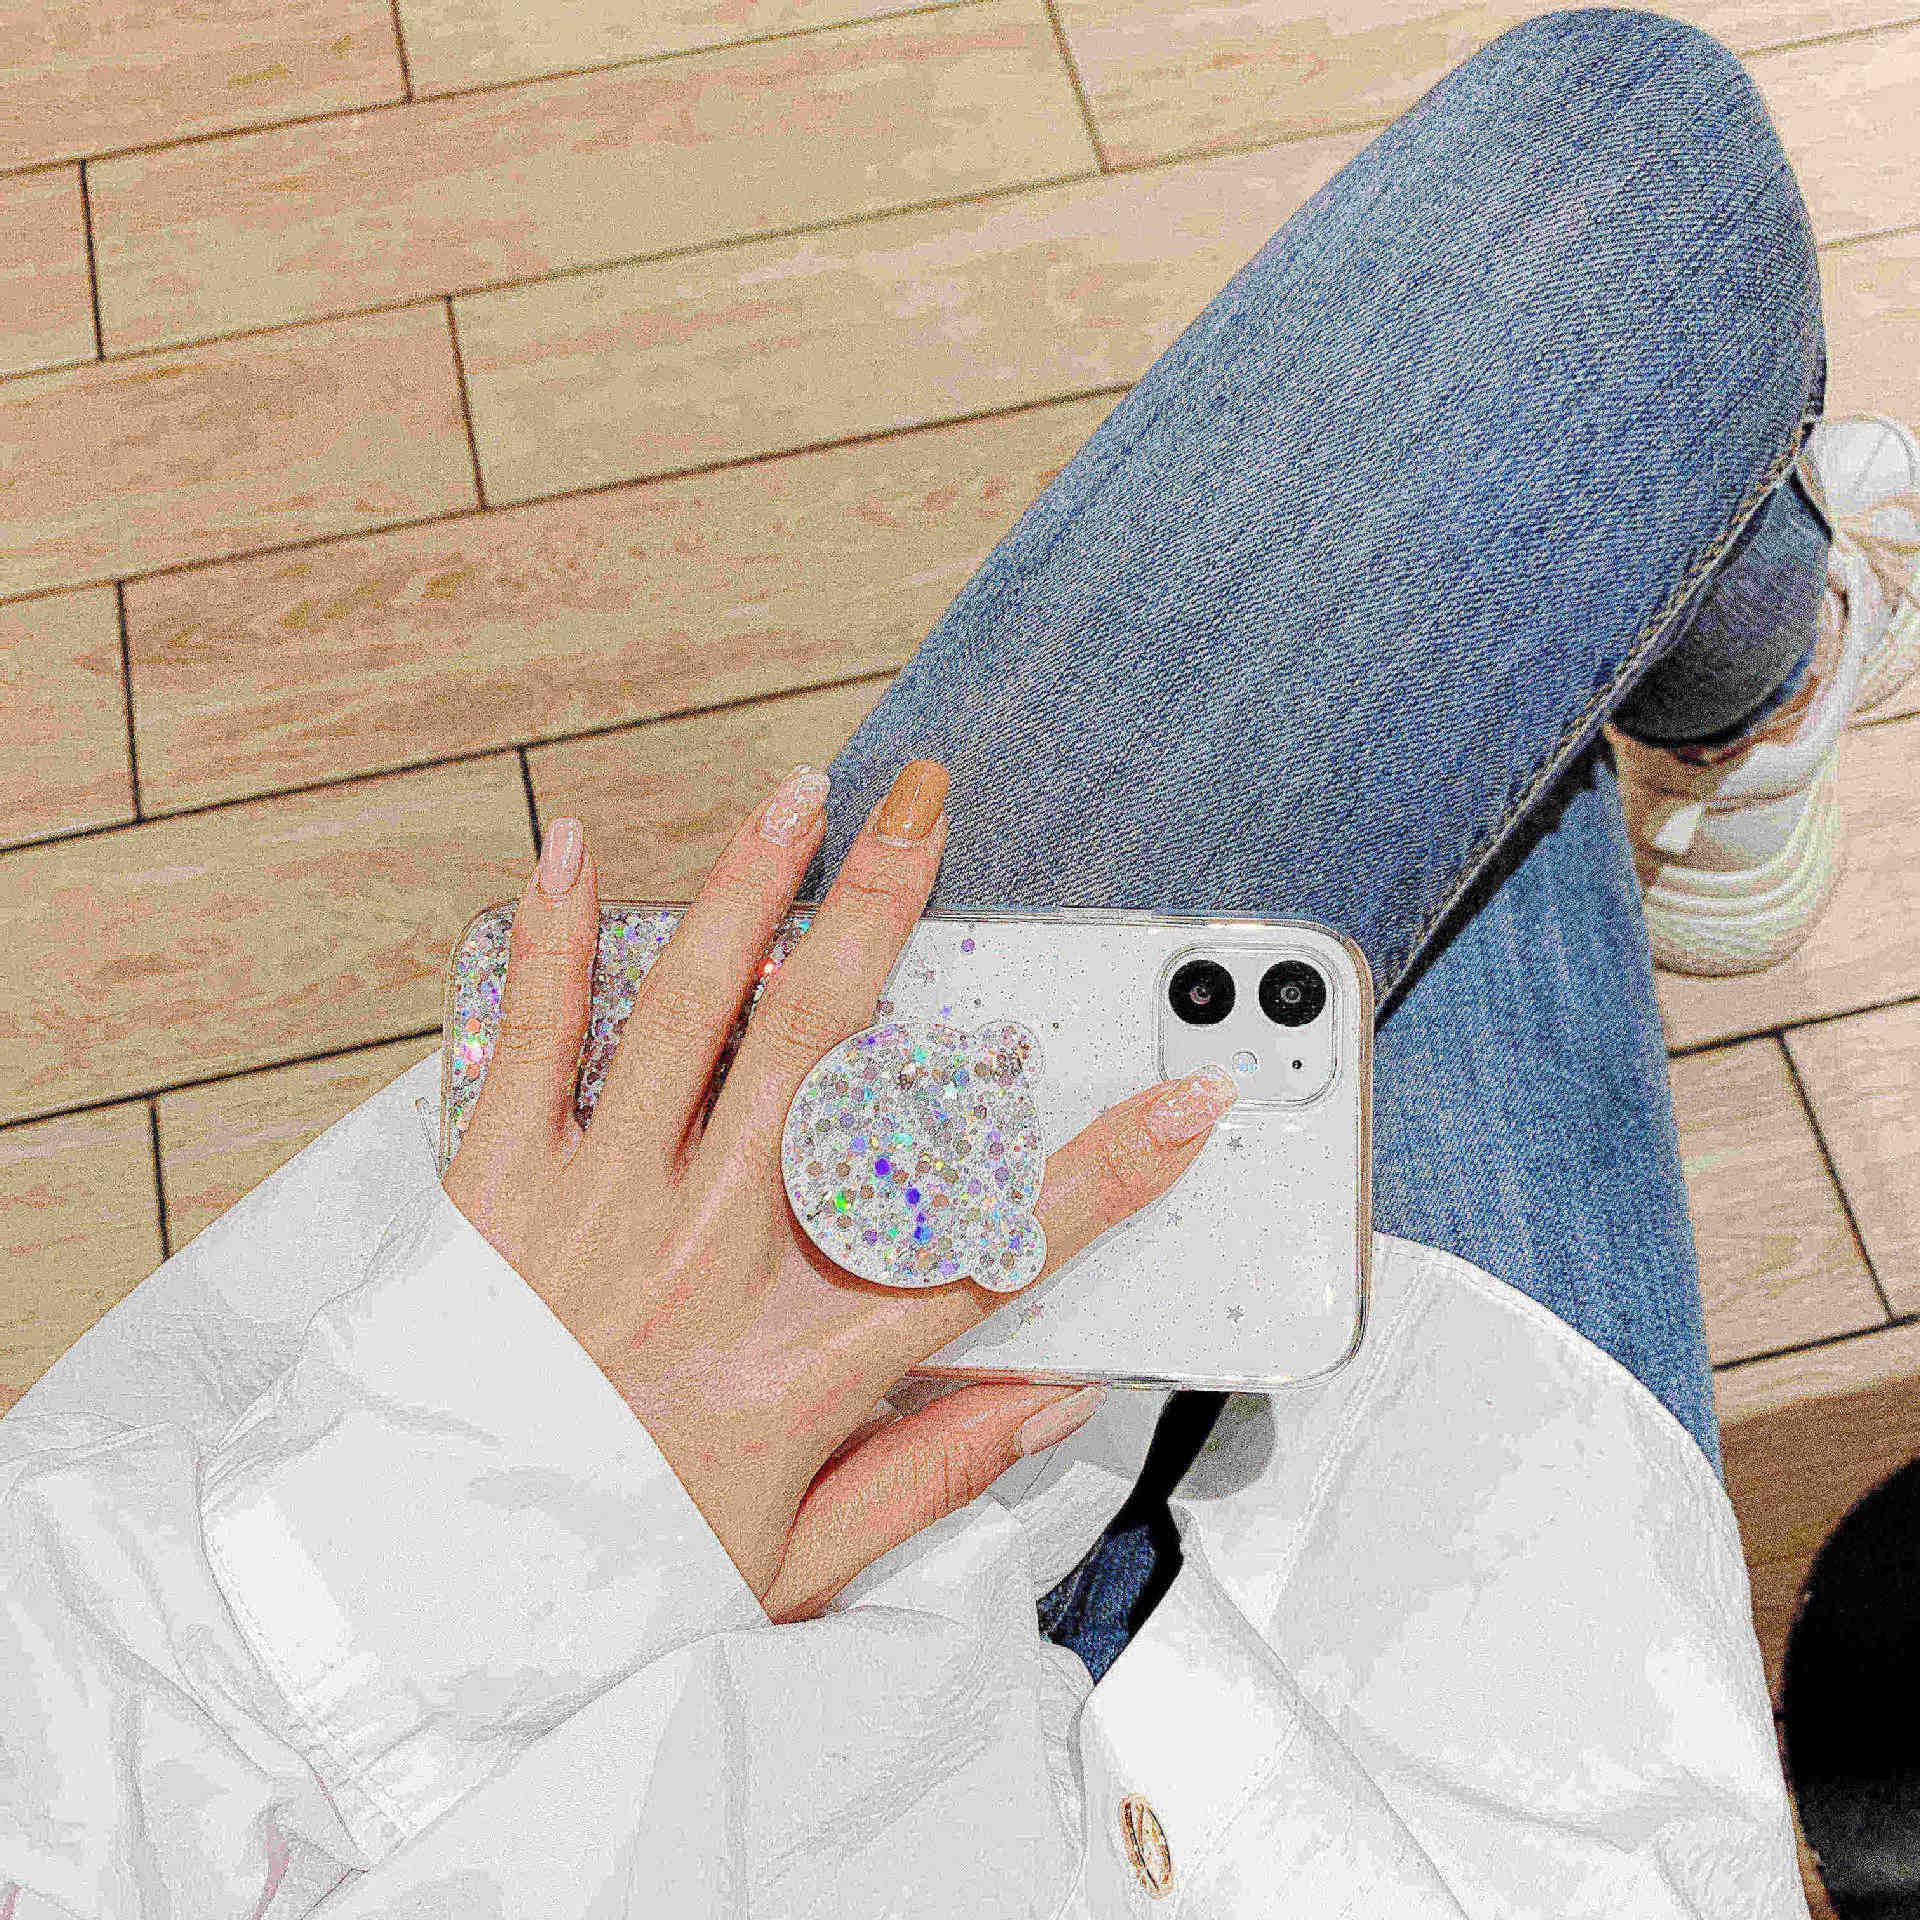 Bling glitter casos de telefone para iphone 11 caso 11pro max 7 8 plus x xr xs max estrela lantejoulas capa funda suporte panda urso orelha